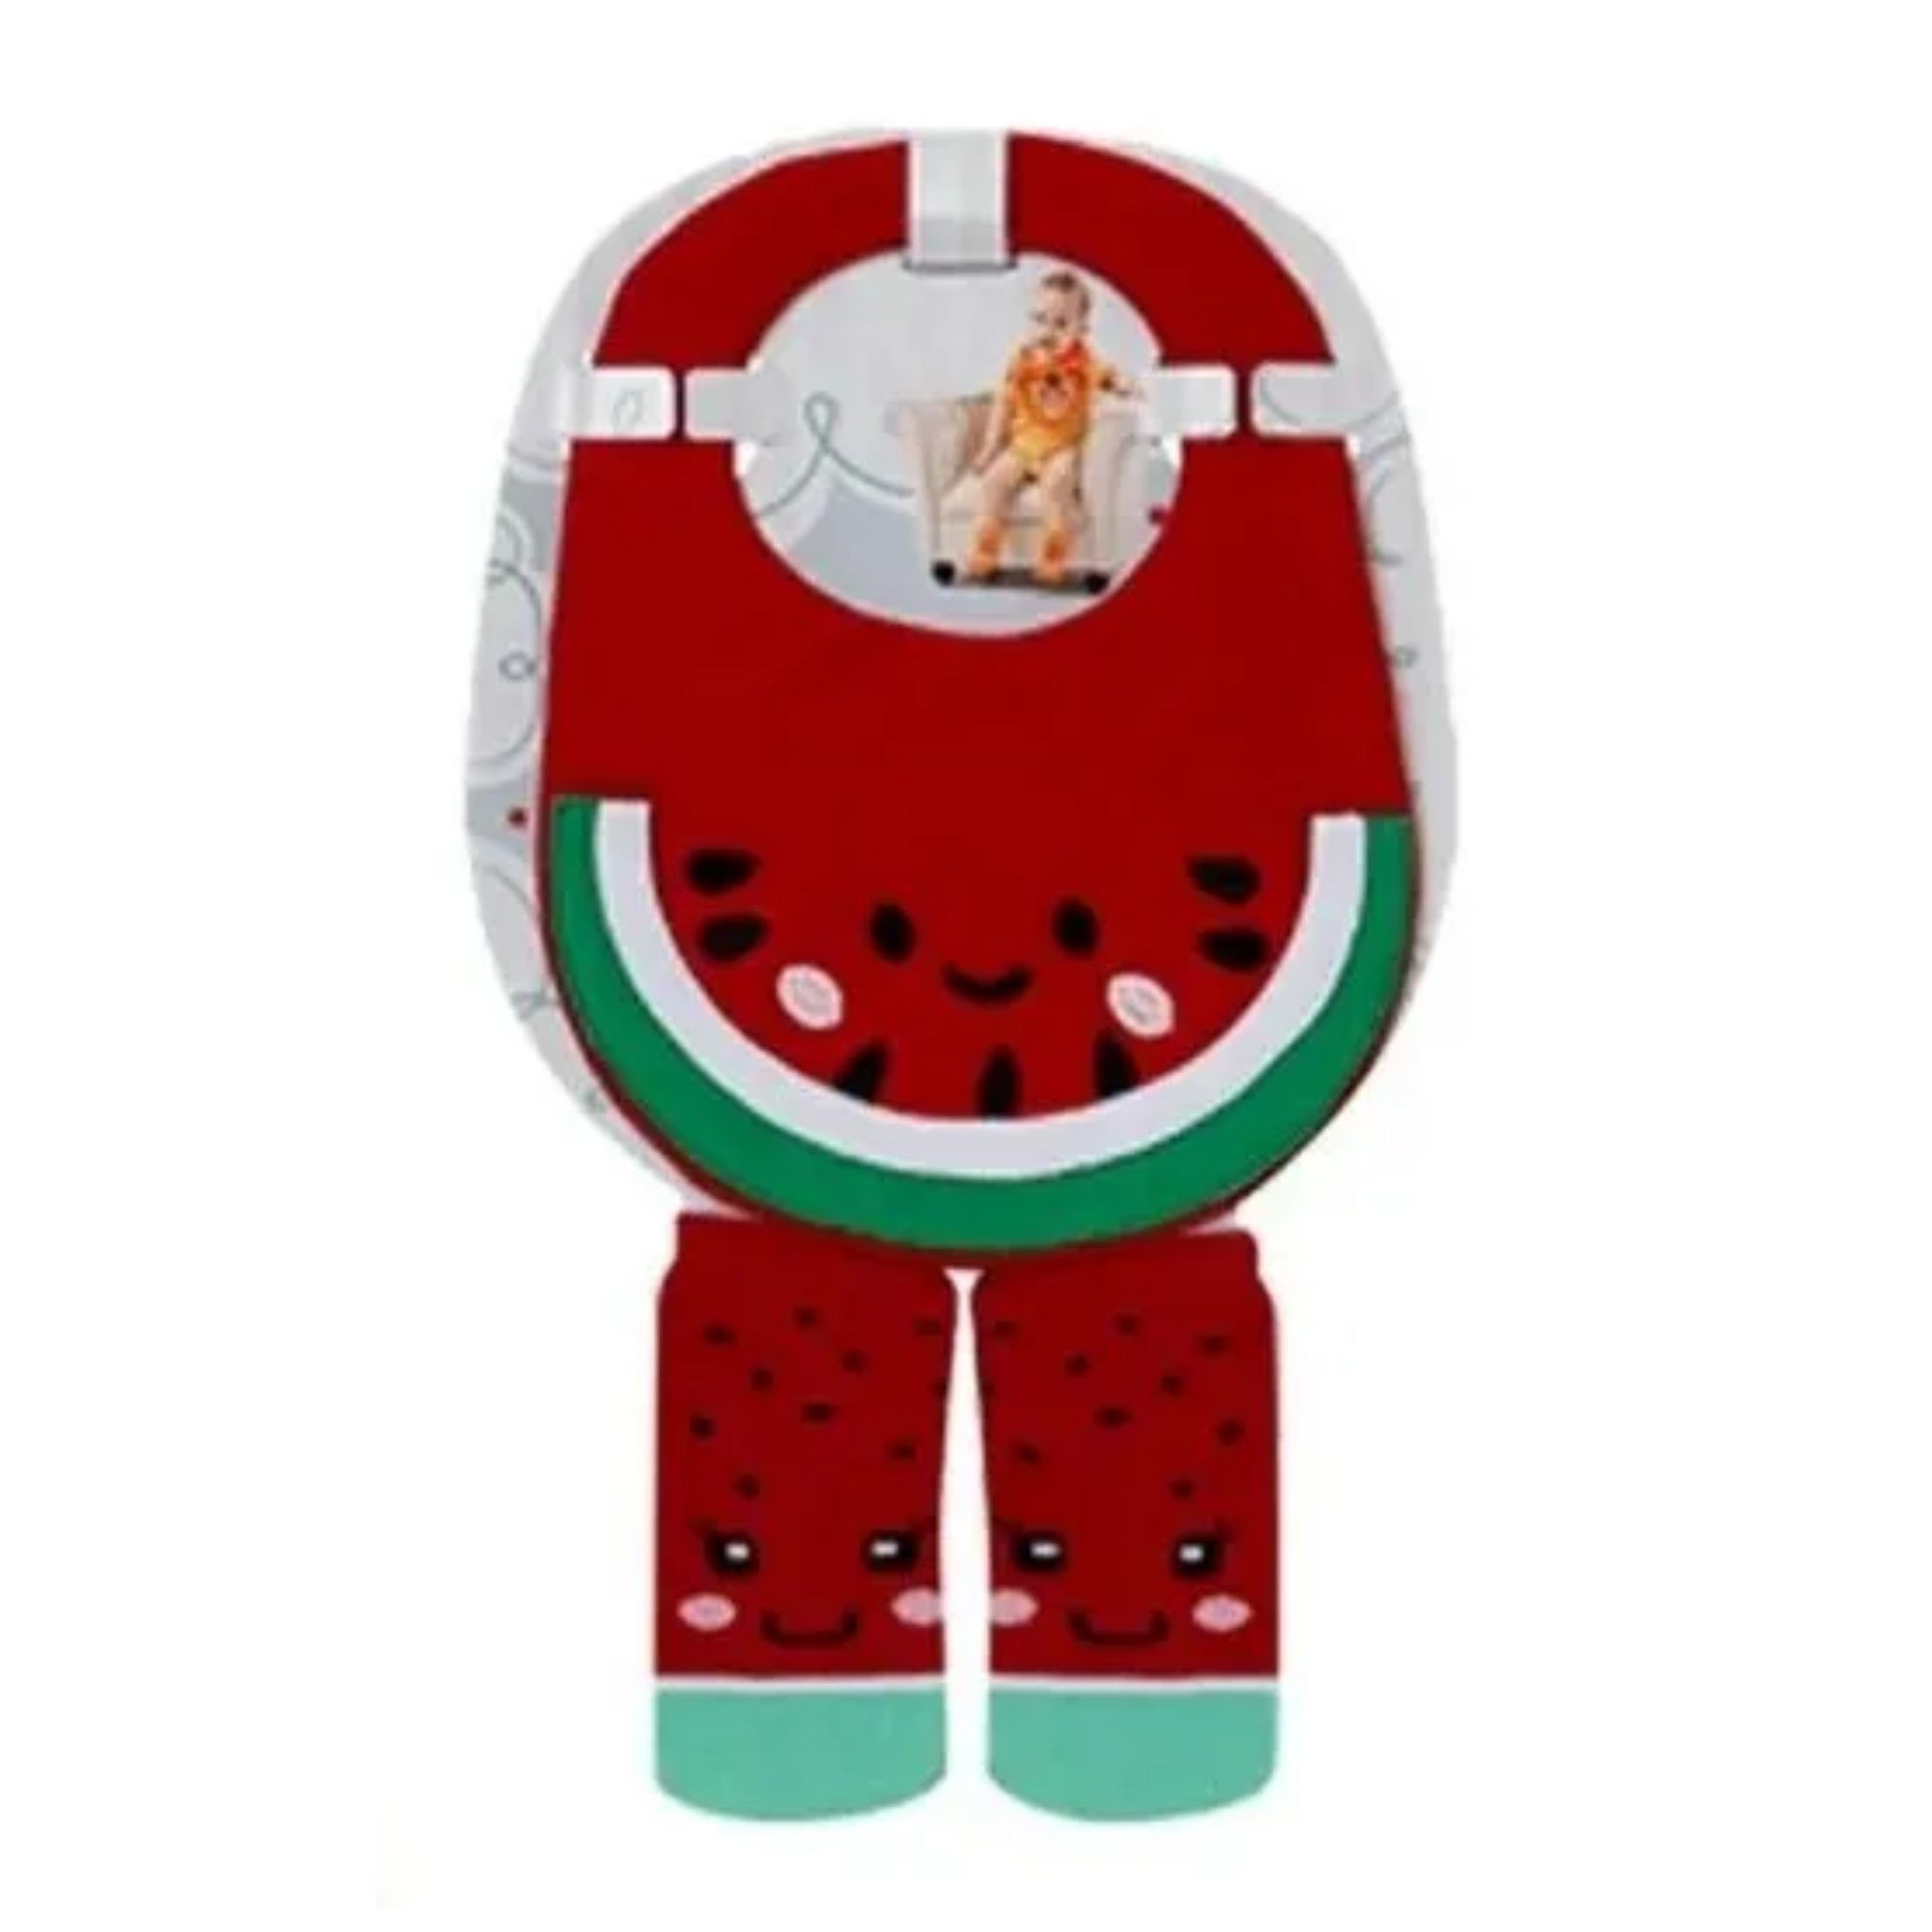 Kit babador menino e menina + meias combinadas 4 a 8 meses  - Game Land Brinquedos